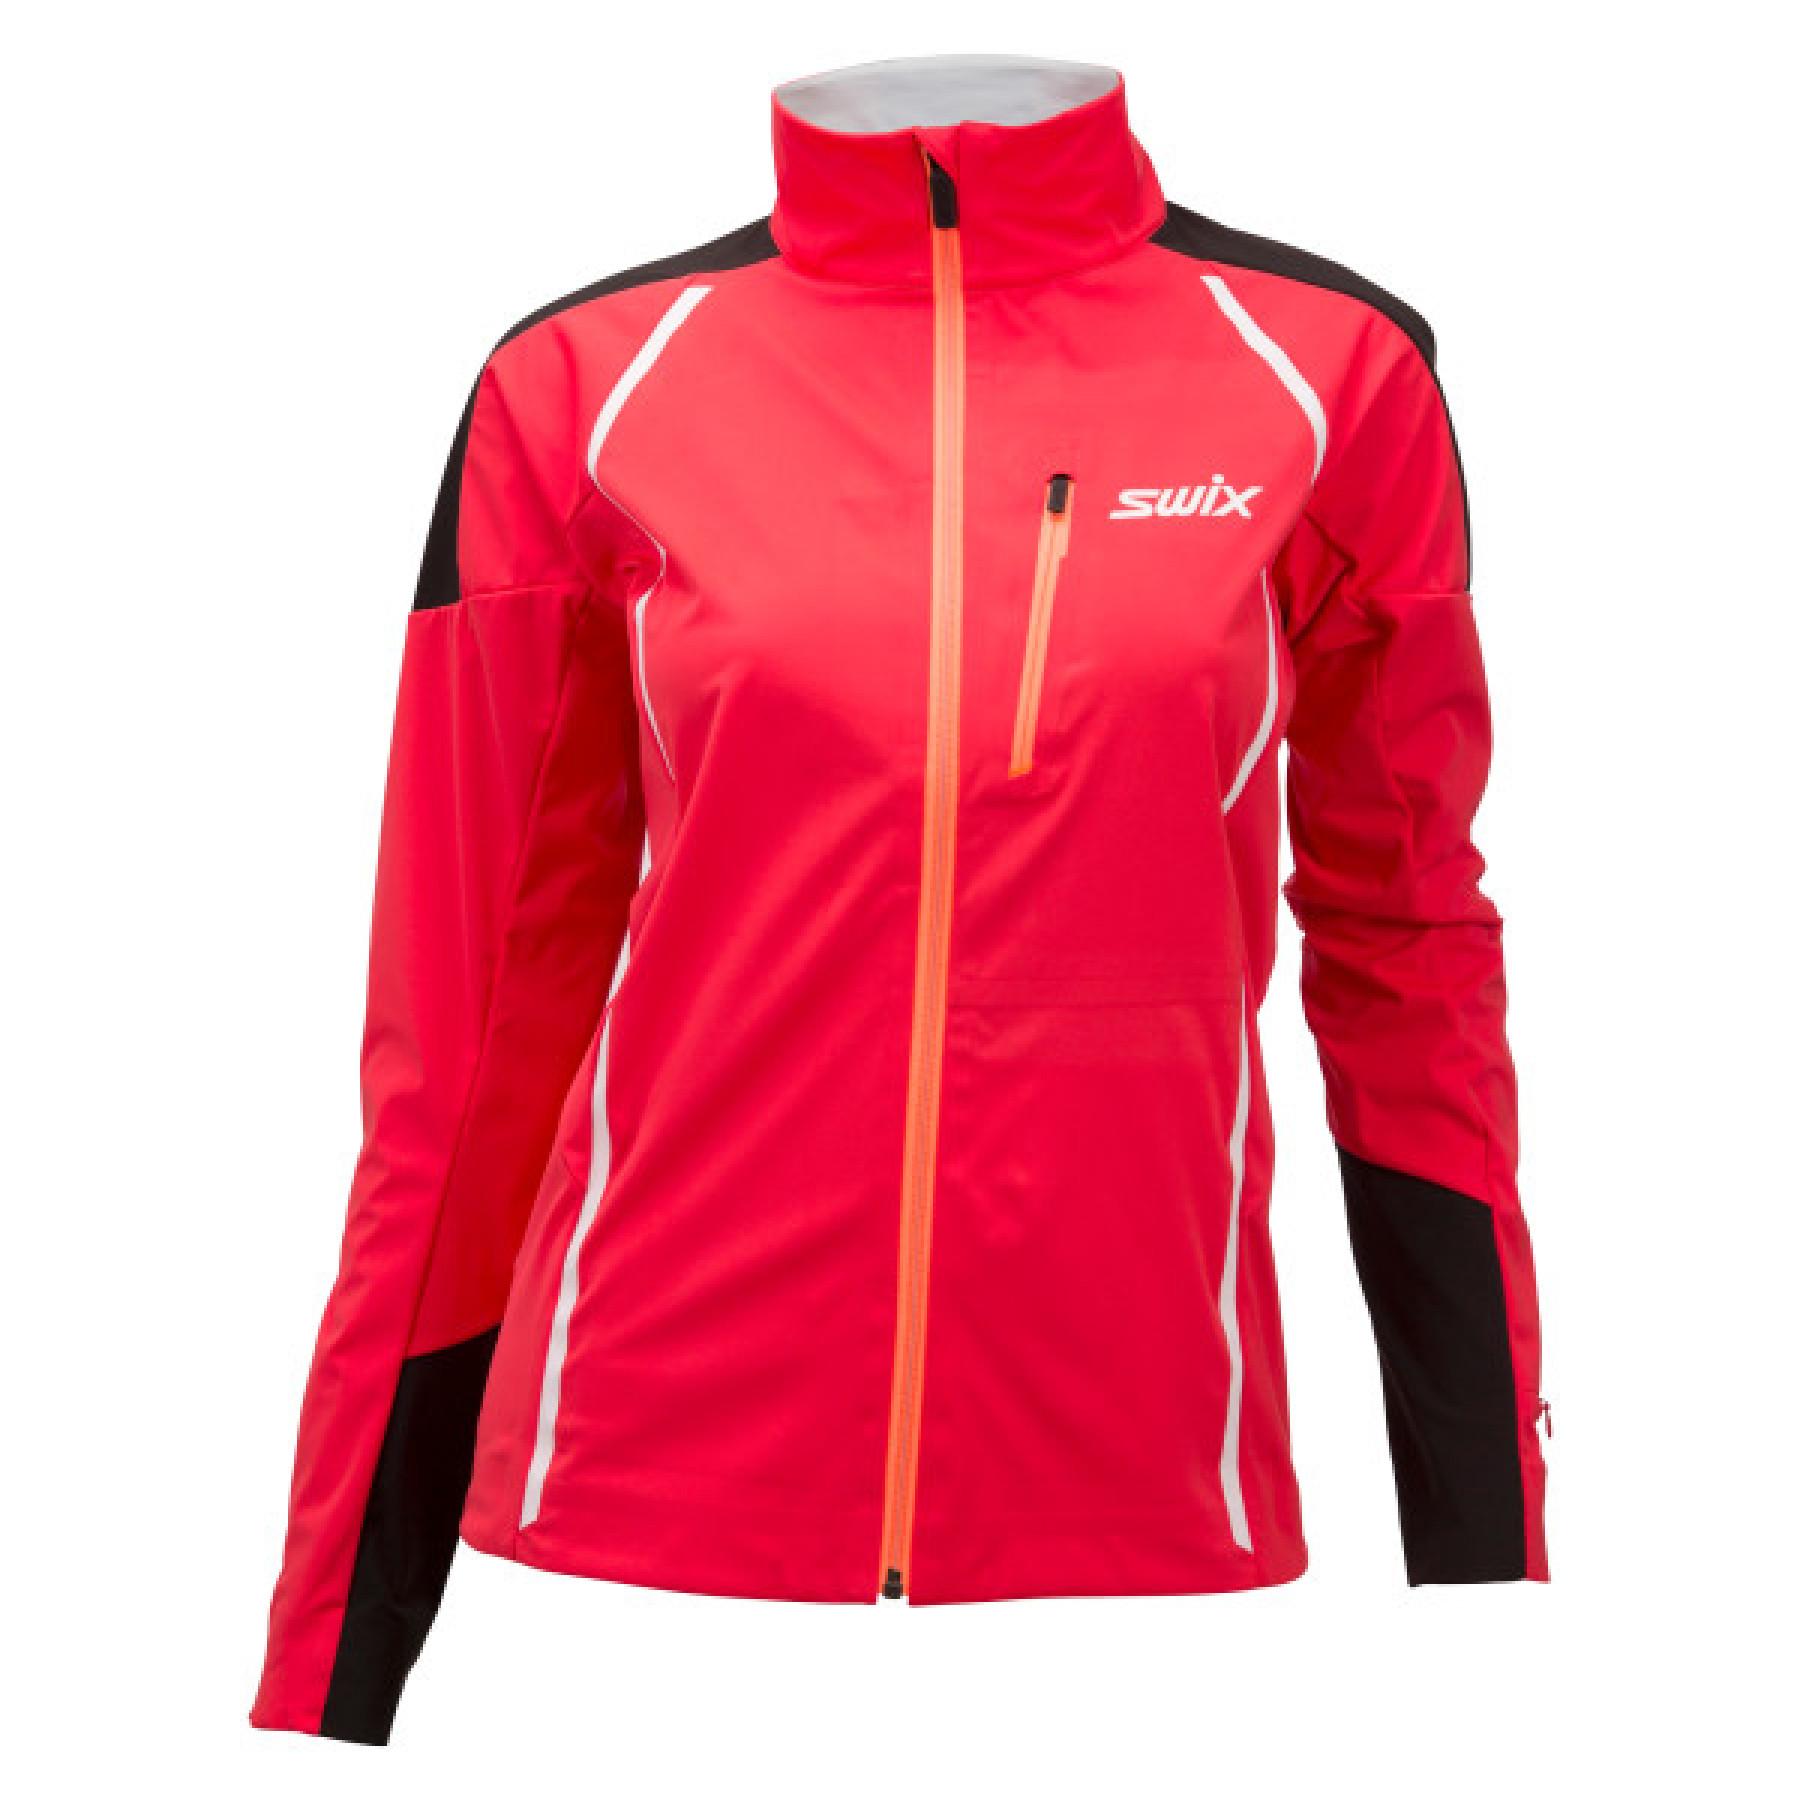 a99ea7c3 Swix Motion Softshell Jacket Women Fire | Supersport.no